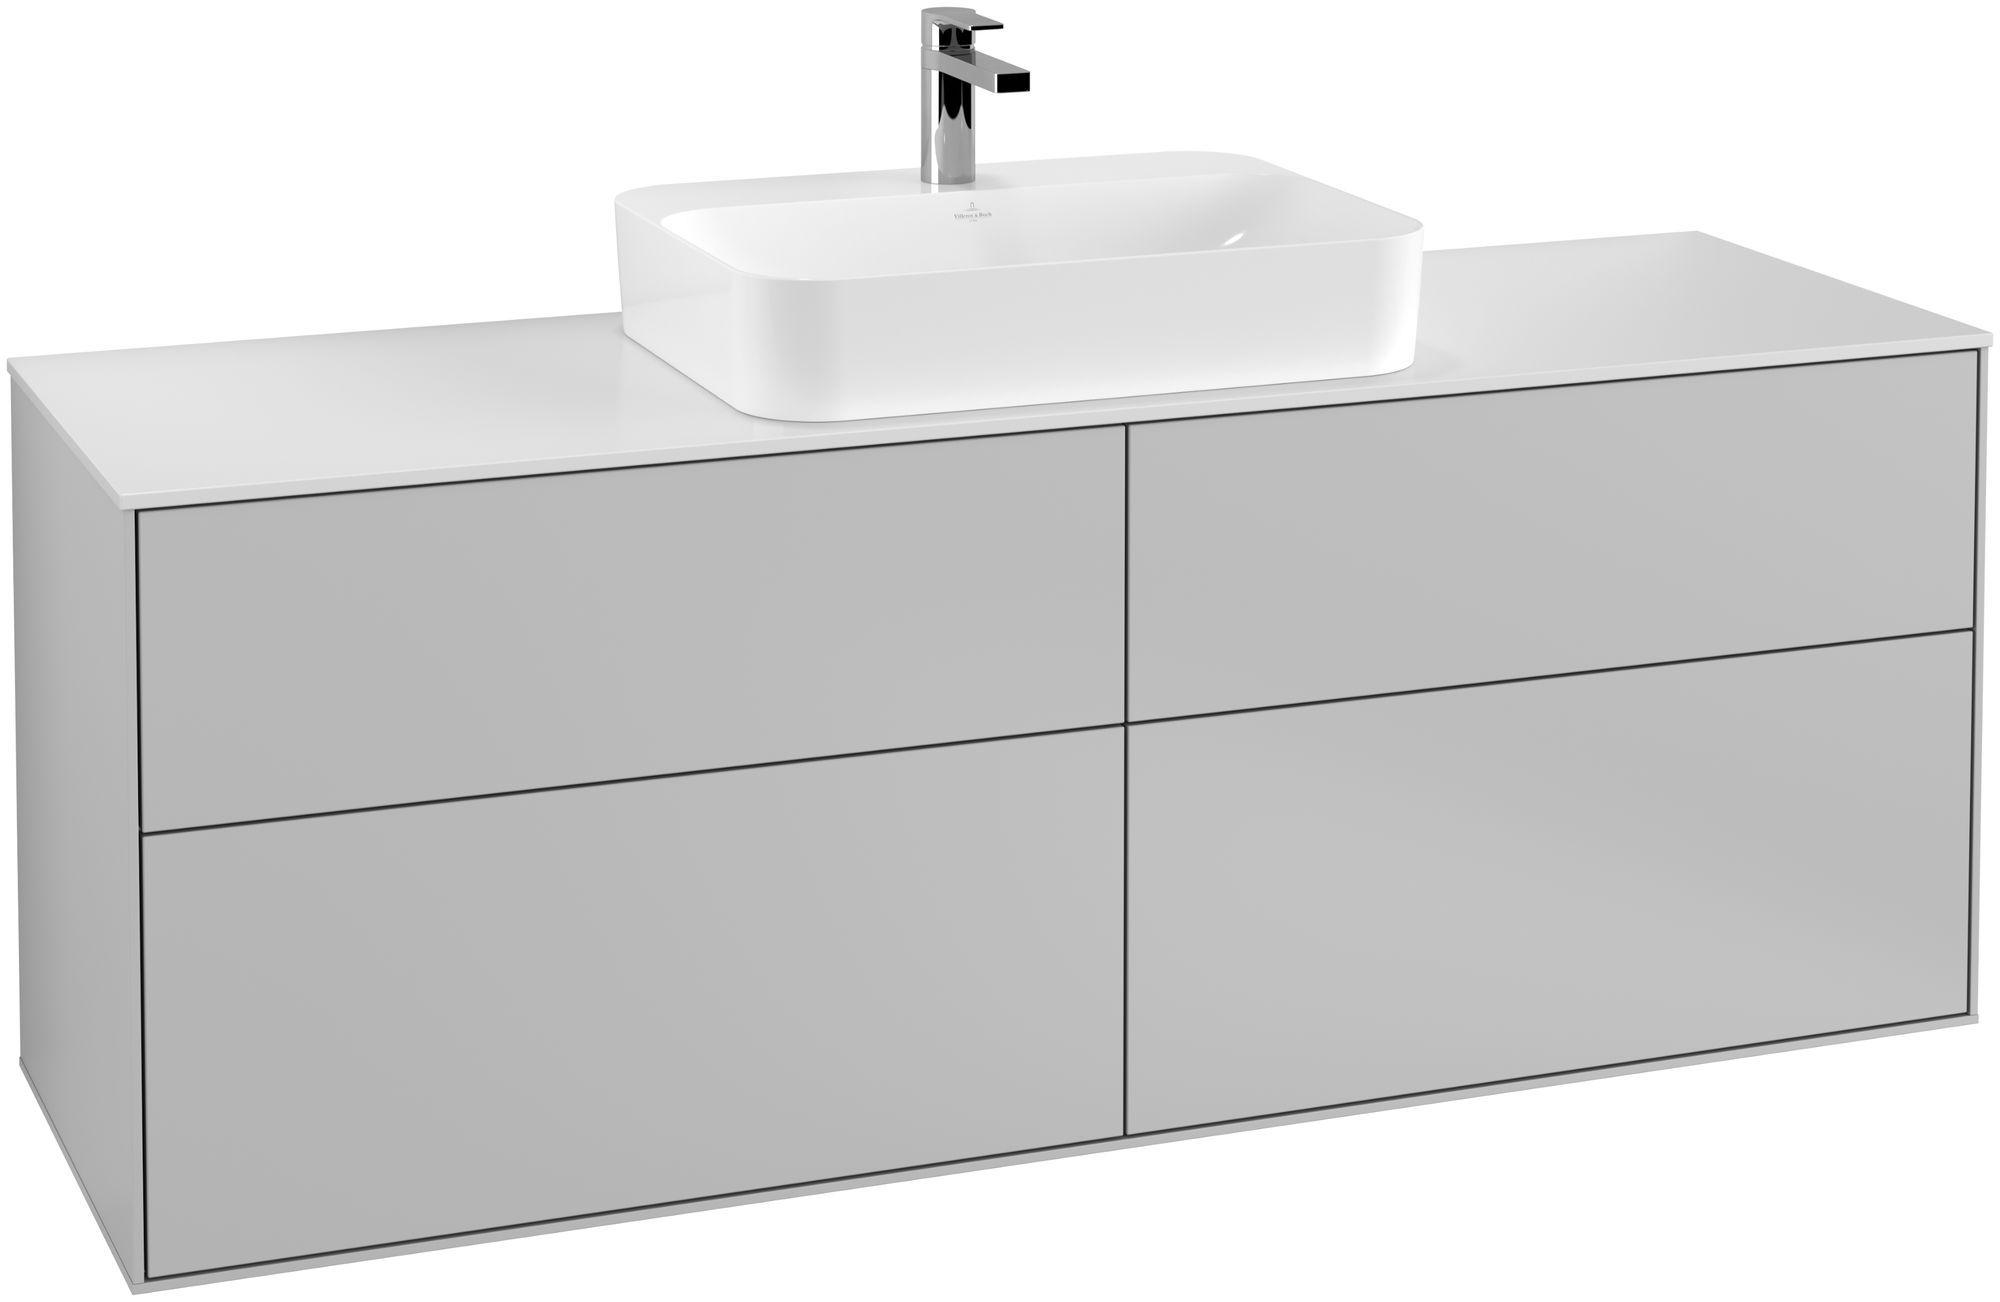 Villeroy & Boch Finion G44 Waschtischunterschrank 4 Auszüge Waschtisch mittig LED-Beleuchtung B:160xH:60,3xT:50,1cm Front, Korpus: Light Grey Matt, Glasplatte: White Matt G44100GJ